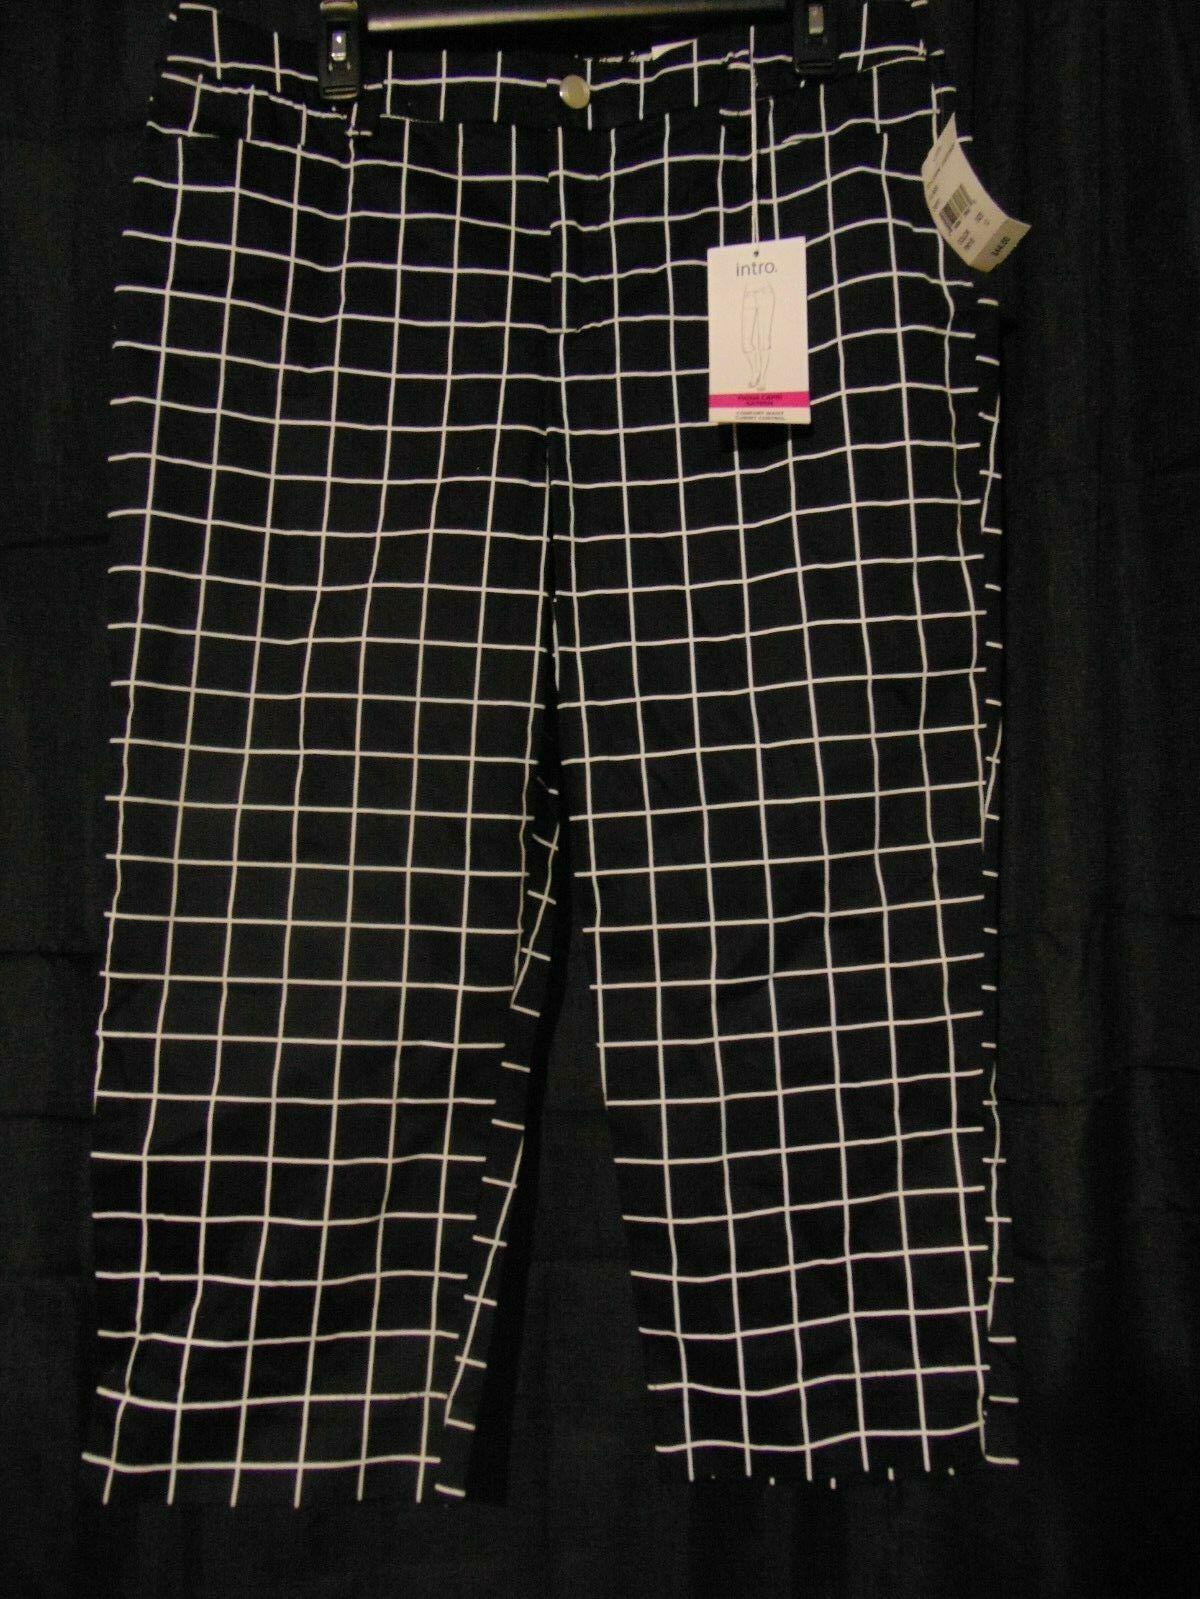 0b2c4cad3c450b 57. 57. Previous. Intro Love The Fit Fiona Comfort Waist Black Capri  Cropped Pants Size 12